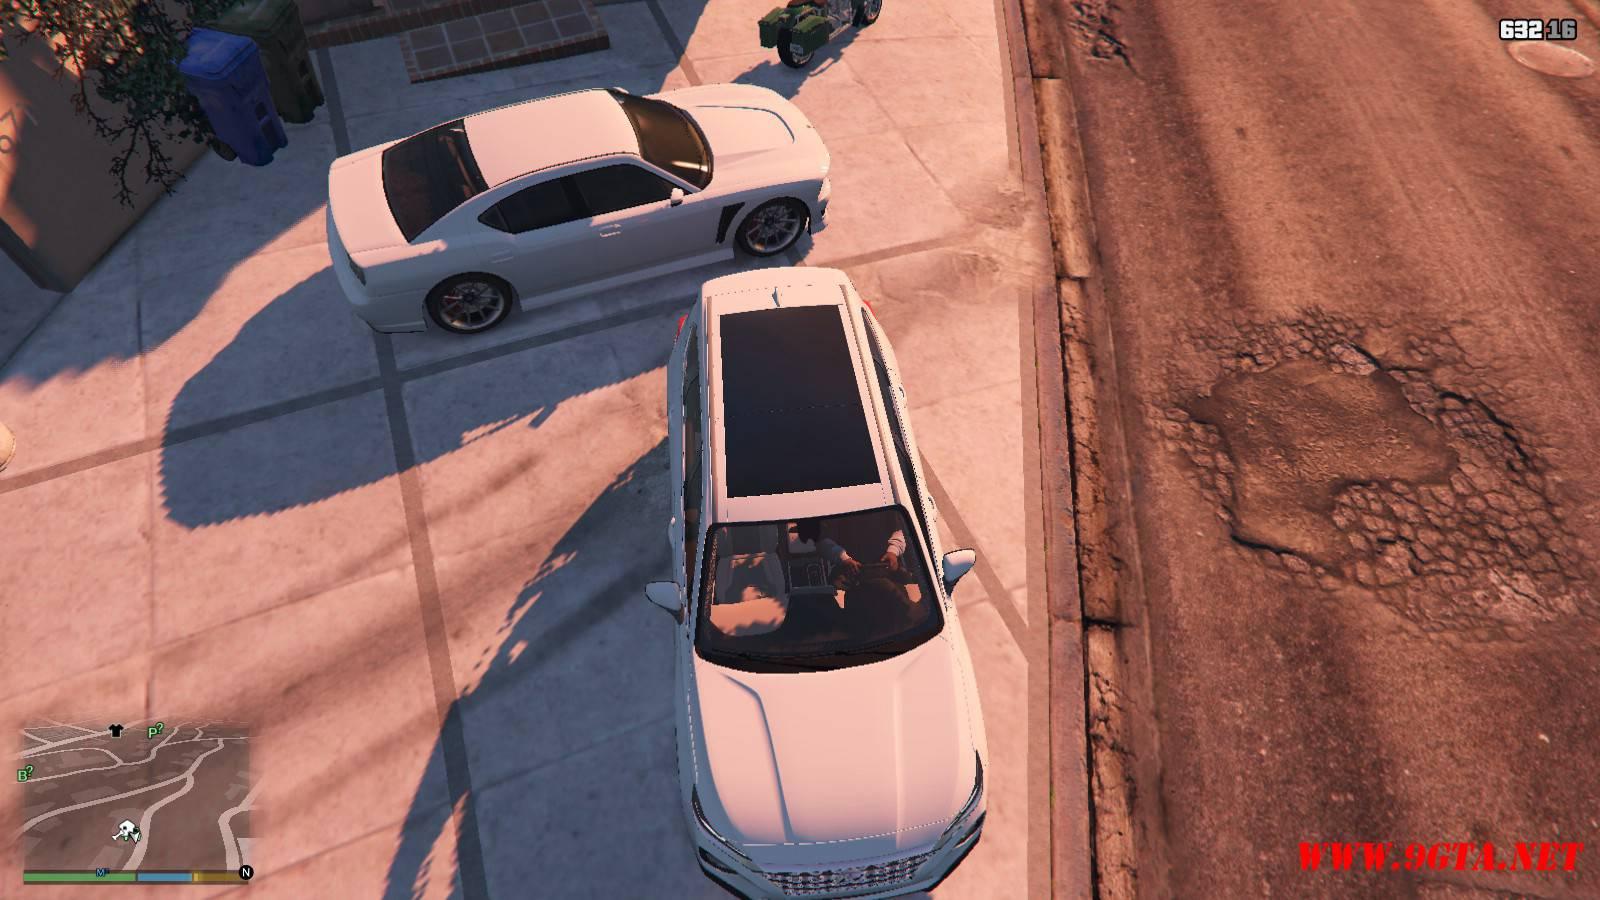 2019 Huyndai Santa Fe GTA5 mods (12)